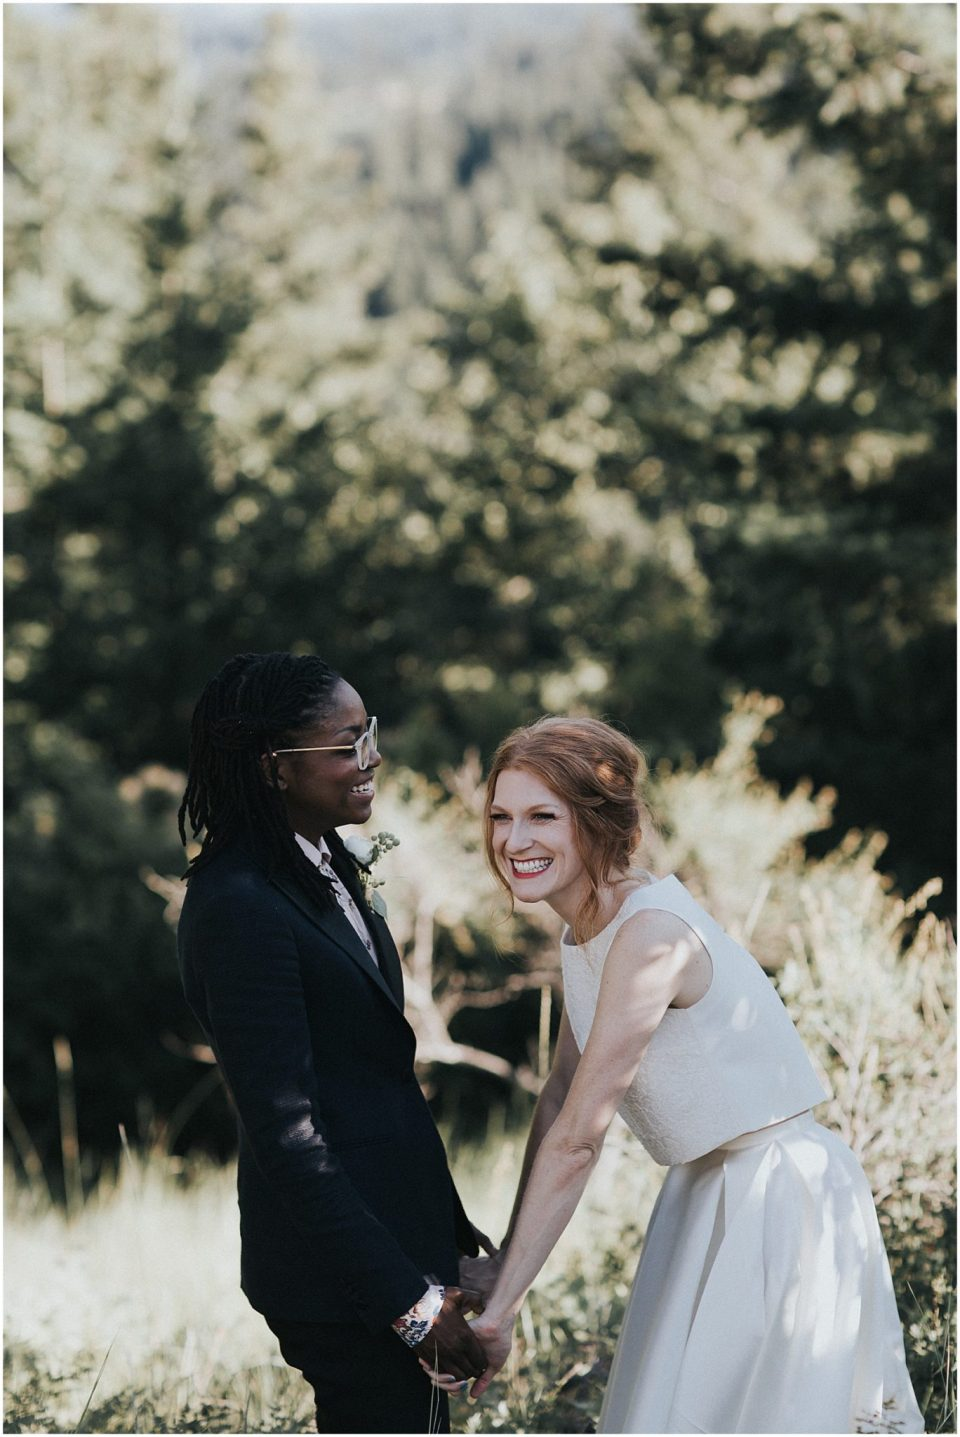 hollis-brittany-sullivan&sullivan-hoodriverwedding (28 of 54)_seattle wedding.jpg